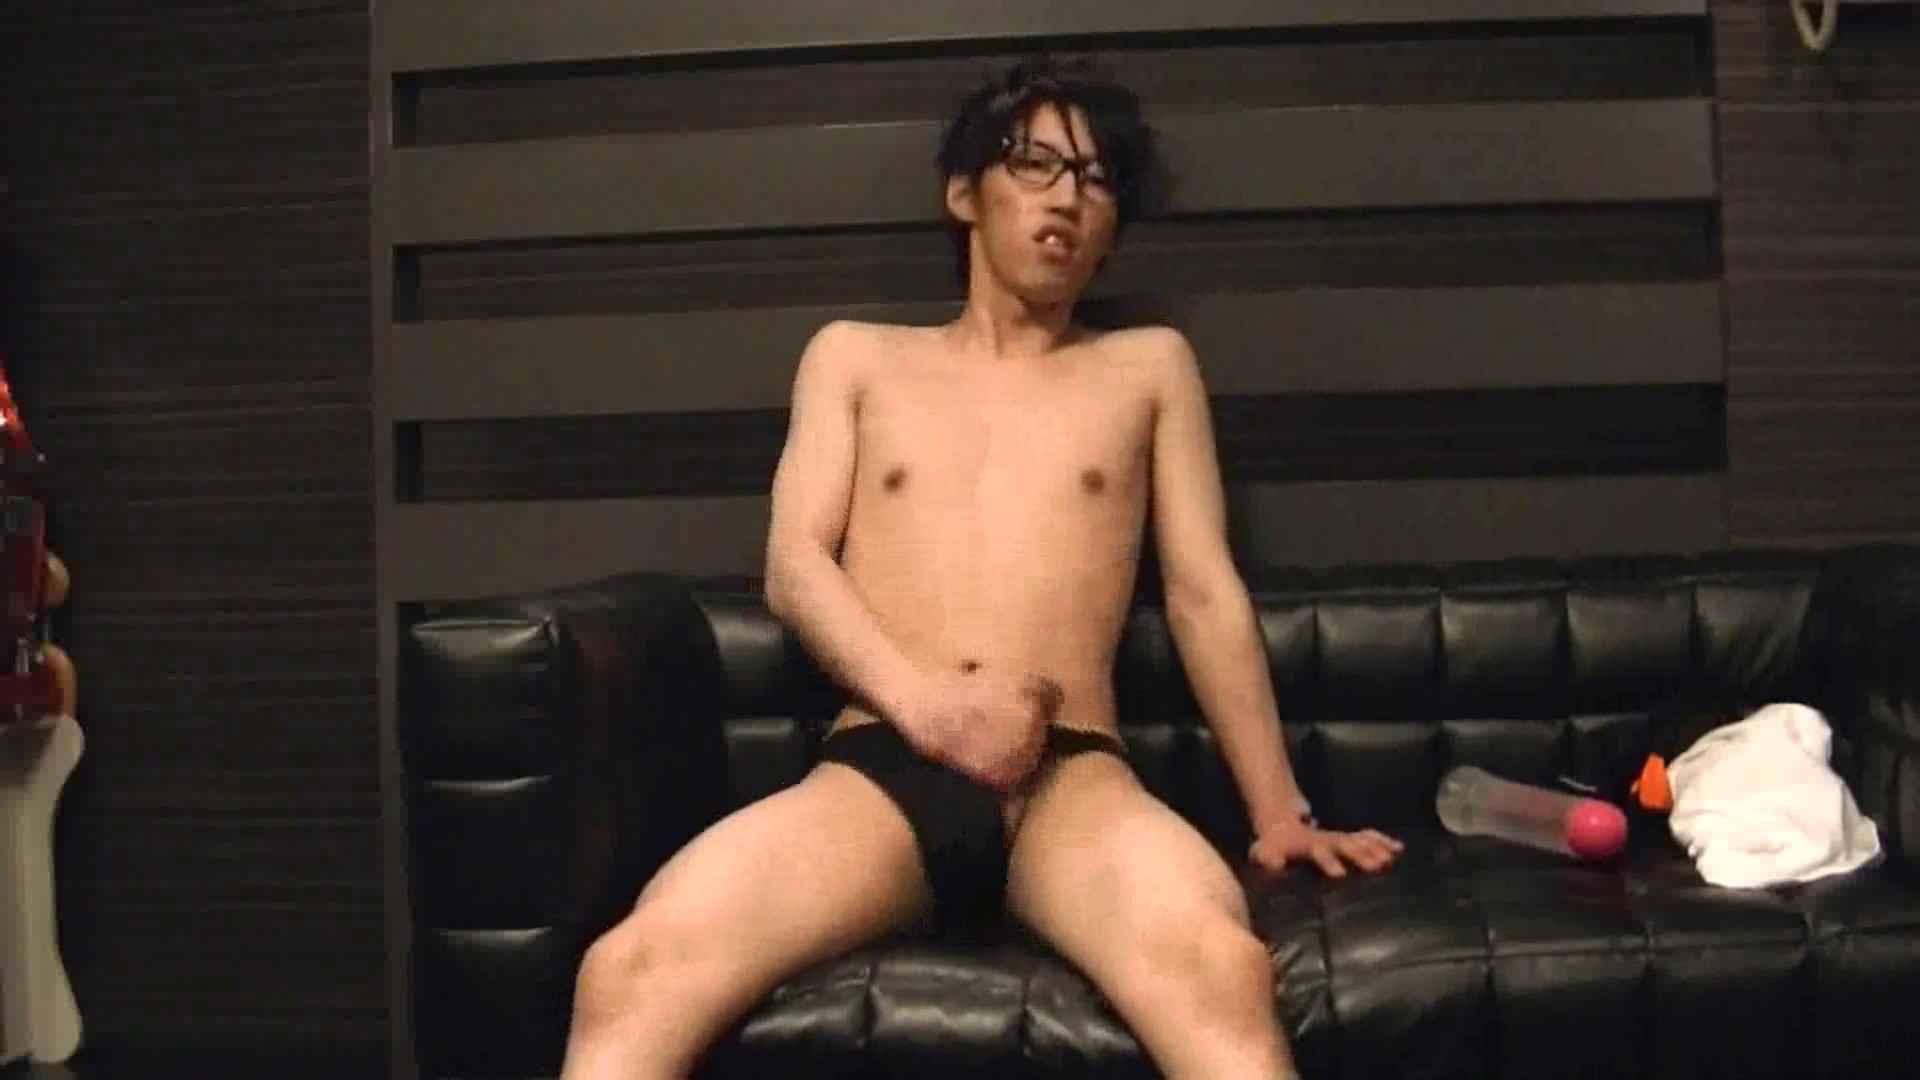 ONA見せカーニバル!! Vol3 男 ゲイ無料無修正画像 89枚 49